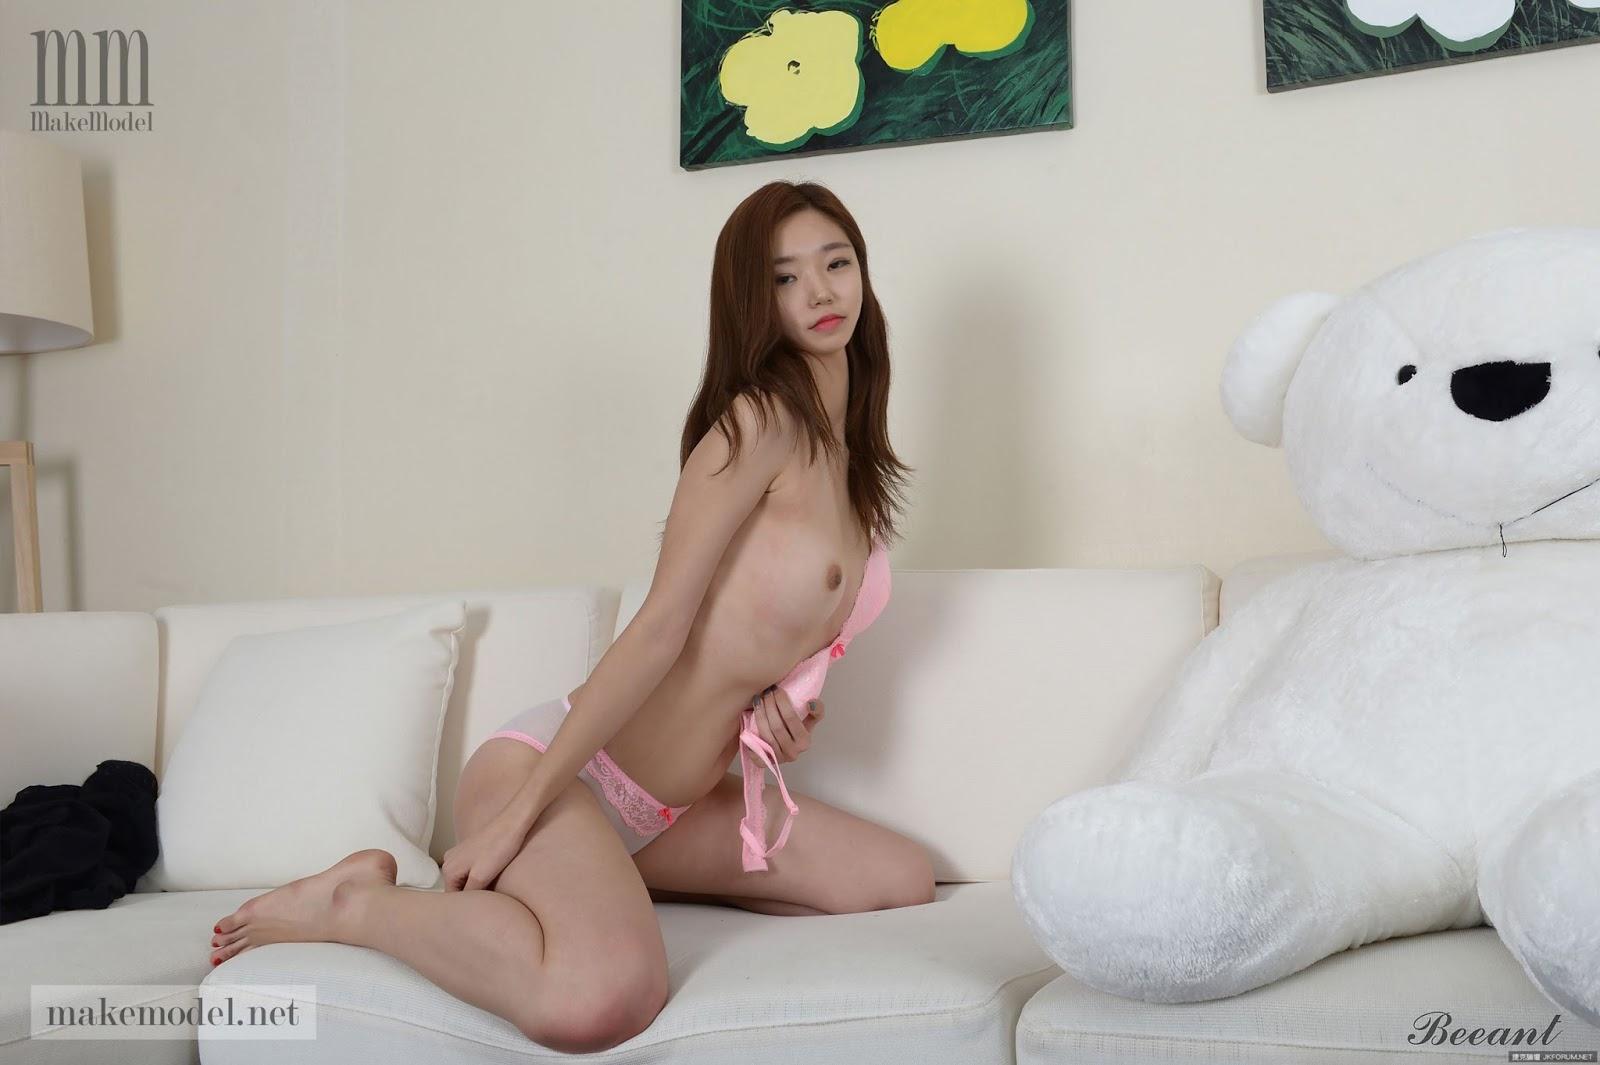 270912 3448 - Korean Nude - Big Albom Remain #A-korean girl